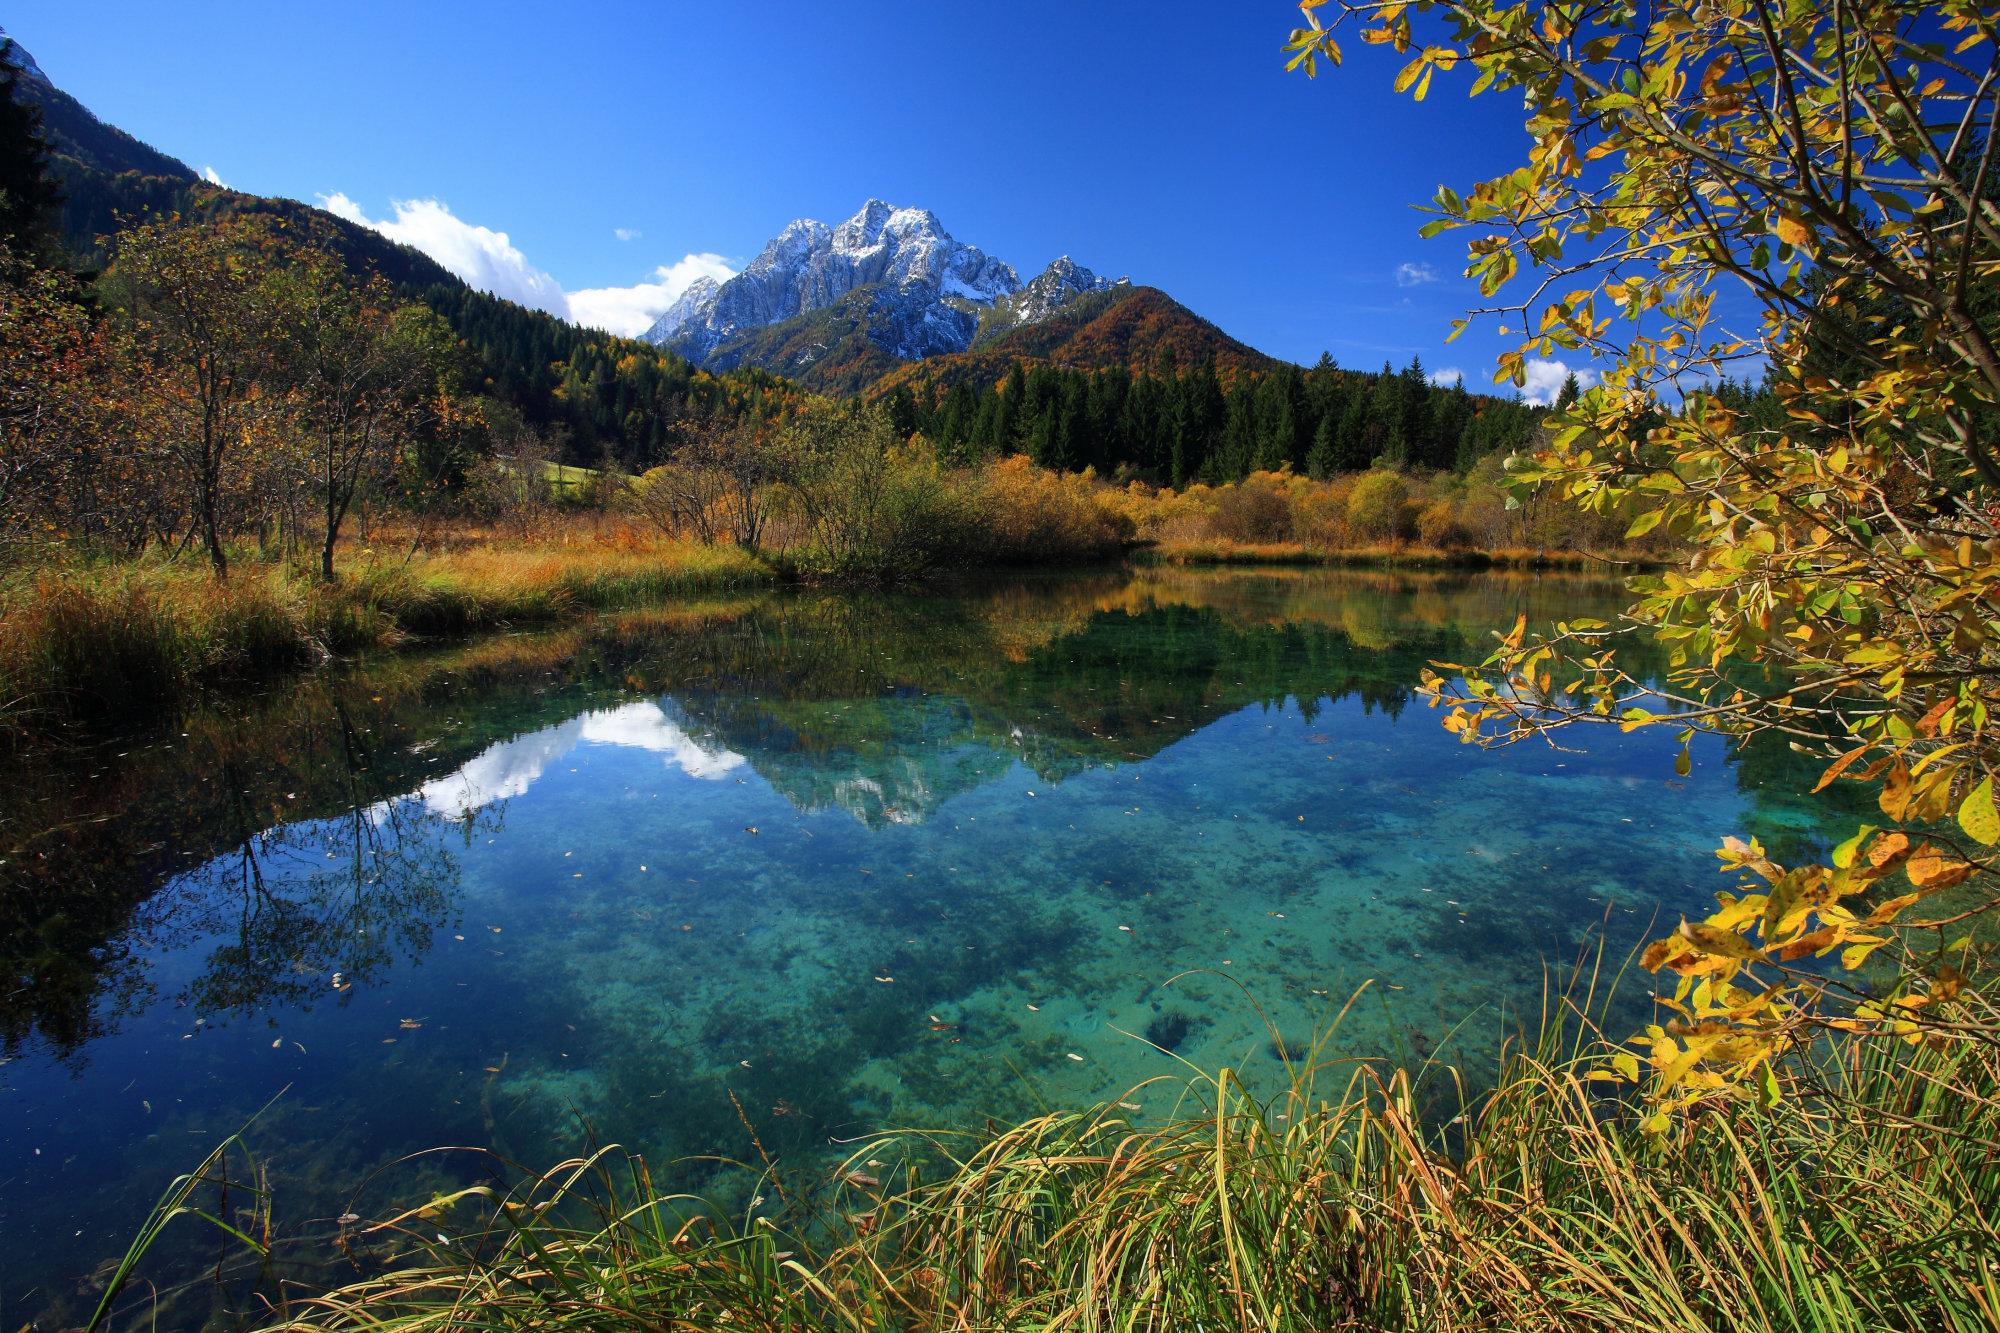 zelenci-nature-reserve-autumn